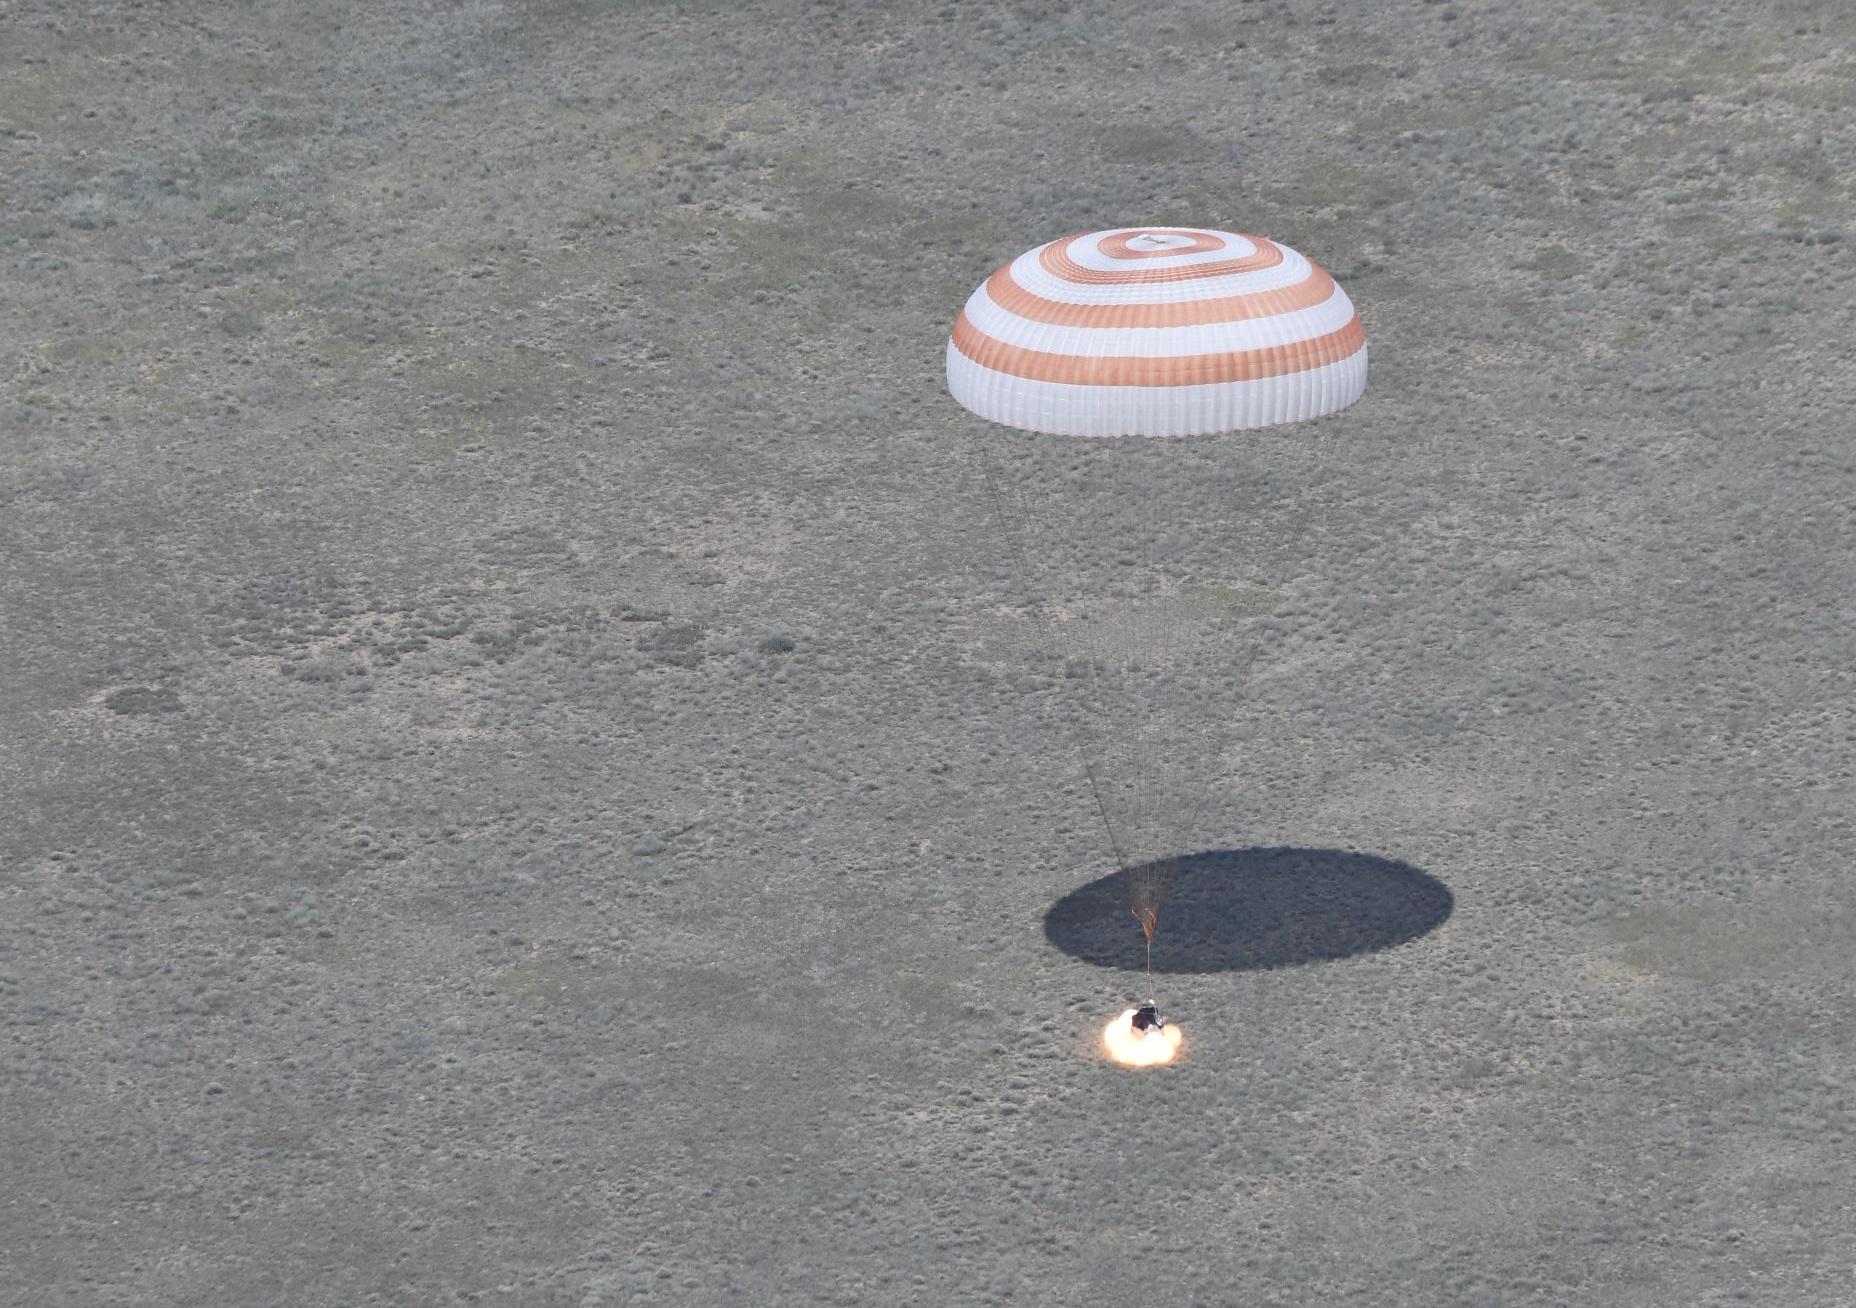 Landing_of_the_Soyuz_TMA-19M_spacecraft8